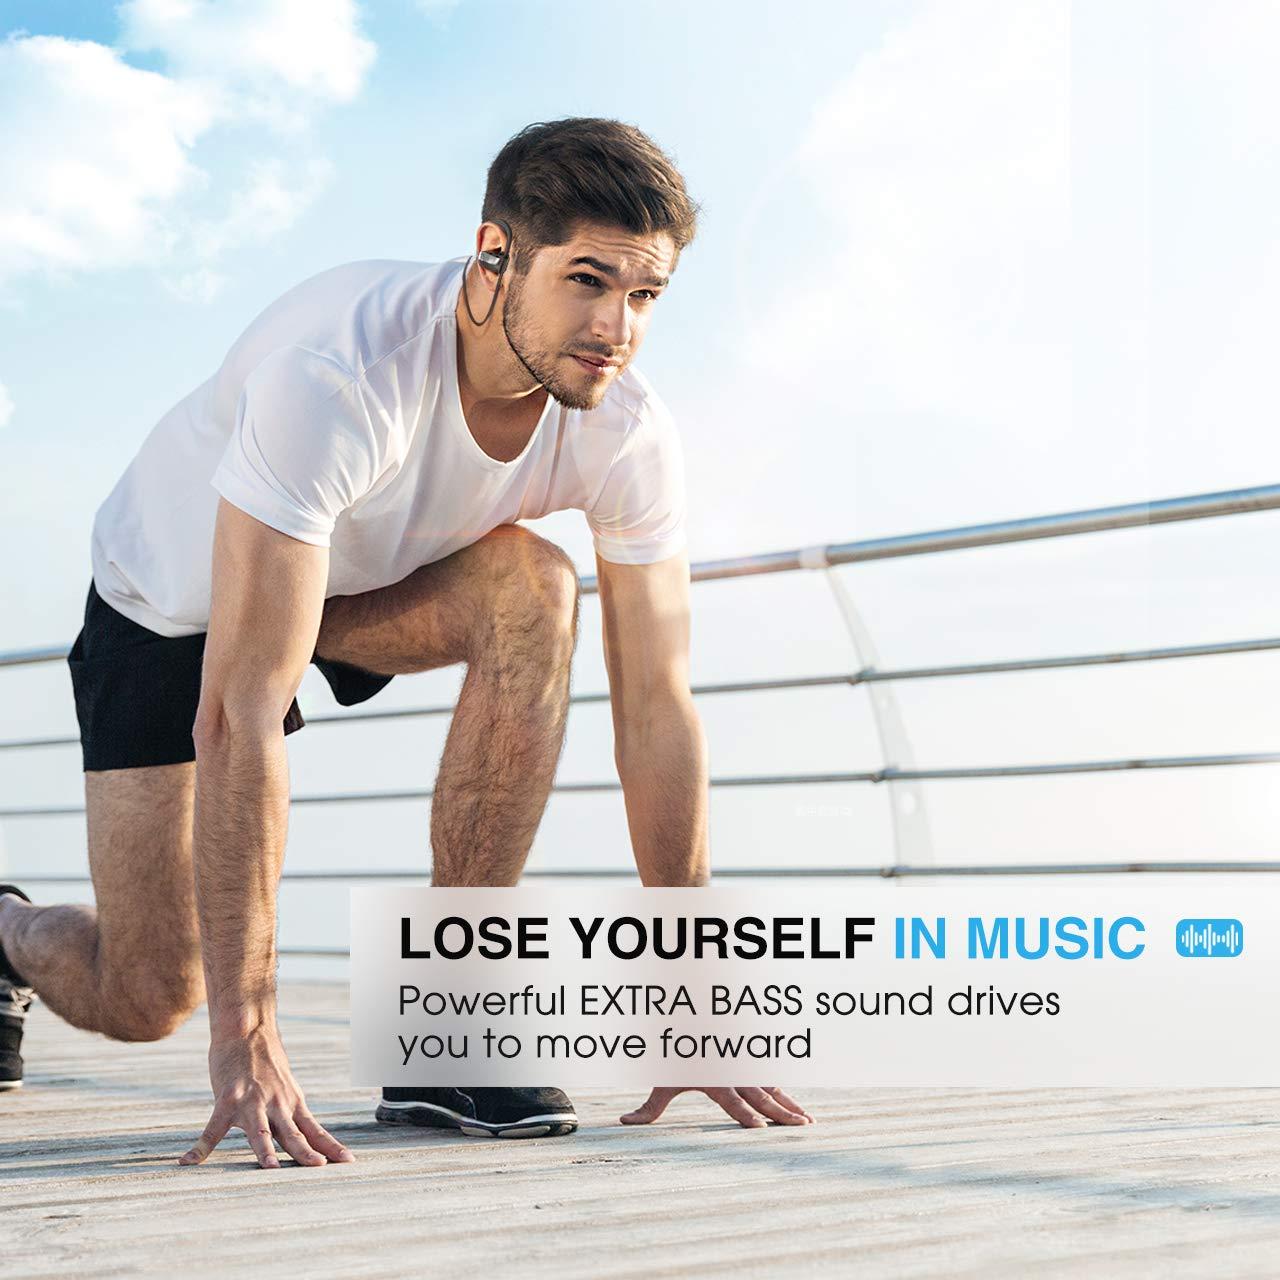 Mpow D7 Bluetooth Headphones Sport, 10H Playtime & IPX7 Waterproof Wireless Headphones Sport Earbuds W/Bass Stereo Sound, Running Headphones Bluetooth Earphones W/CVC 6.0 Noise Cancelling Mic, Black by Mpow (Image #4)